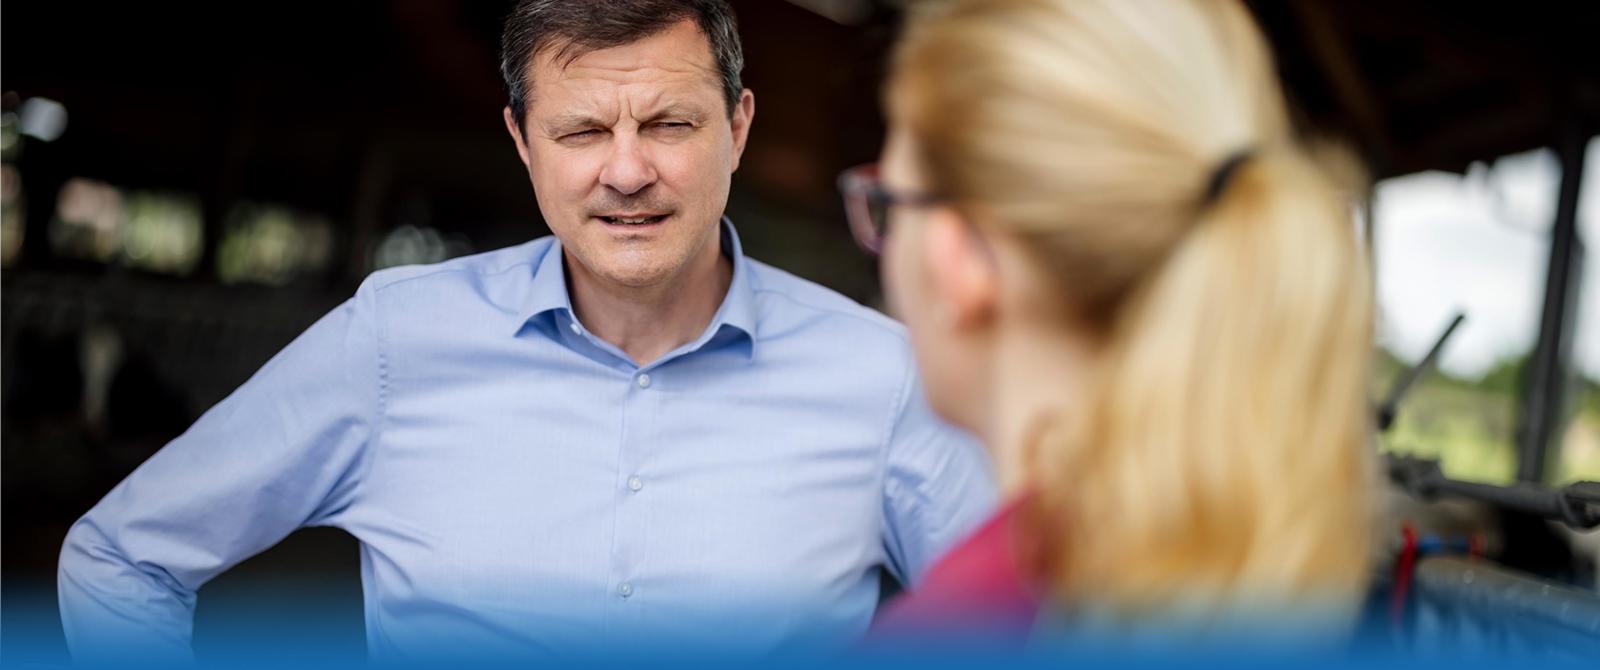 slider-oliver-grundmann-2021-bundestagswahlen-stade-rotenburg-bremervoerde (26)